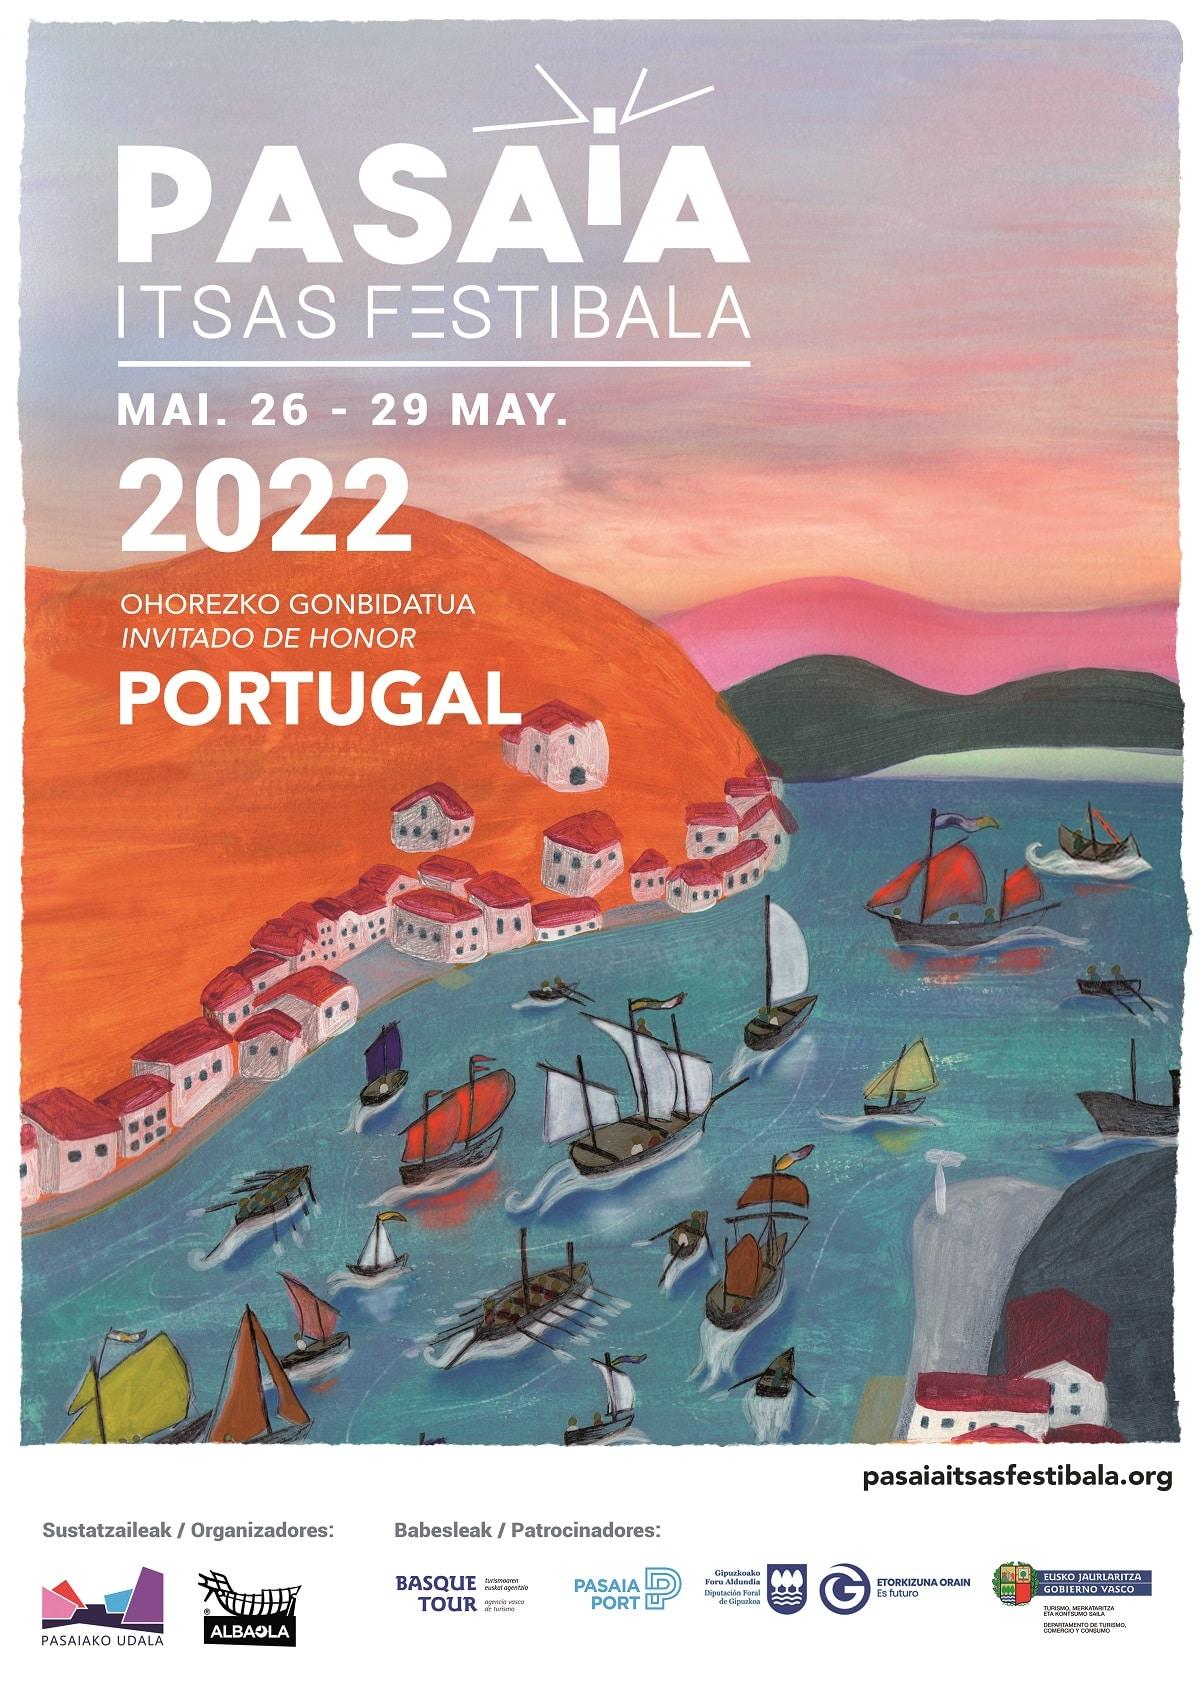 2022 PASAIA ITSAS FESTIBALA KARTELA - El II Pasaia Itsas Festibala se hará realidad del 26 al 29 de mayo de 2022